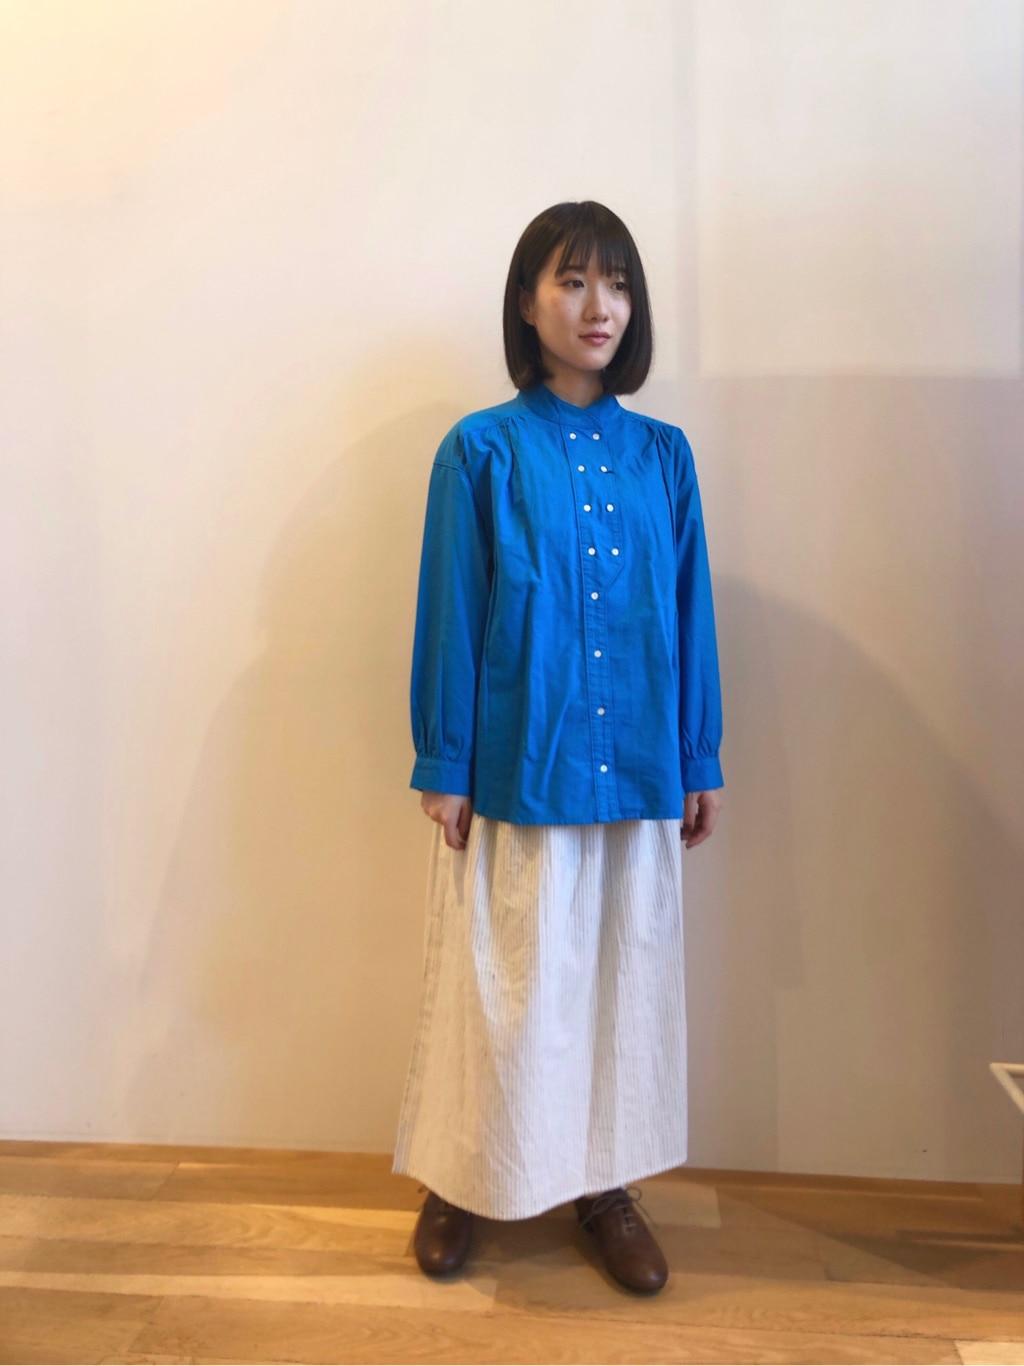 bulle de savon KITTE丸の内 身長:152cm 2020.09.12